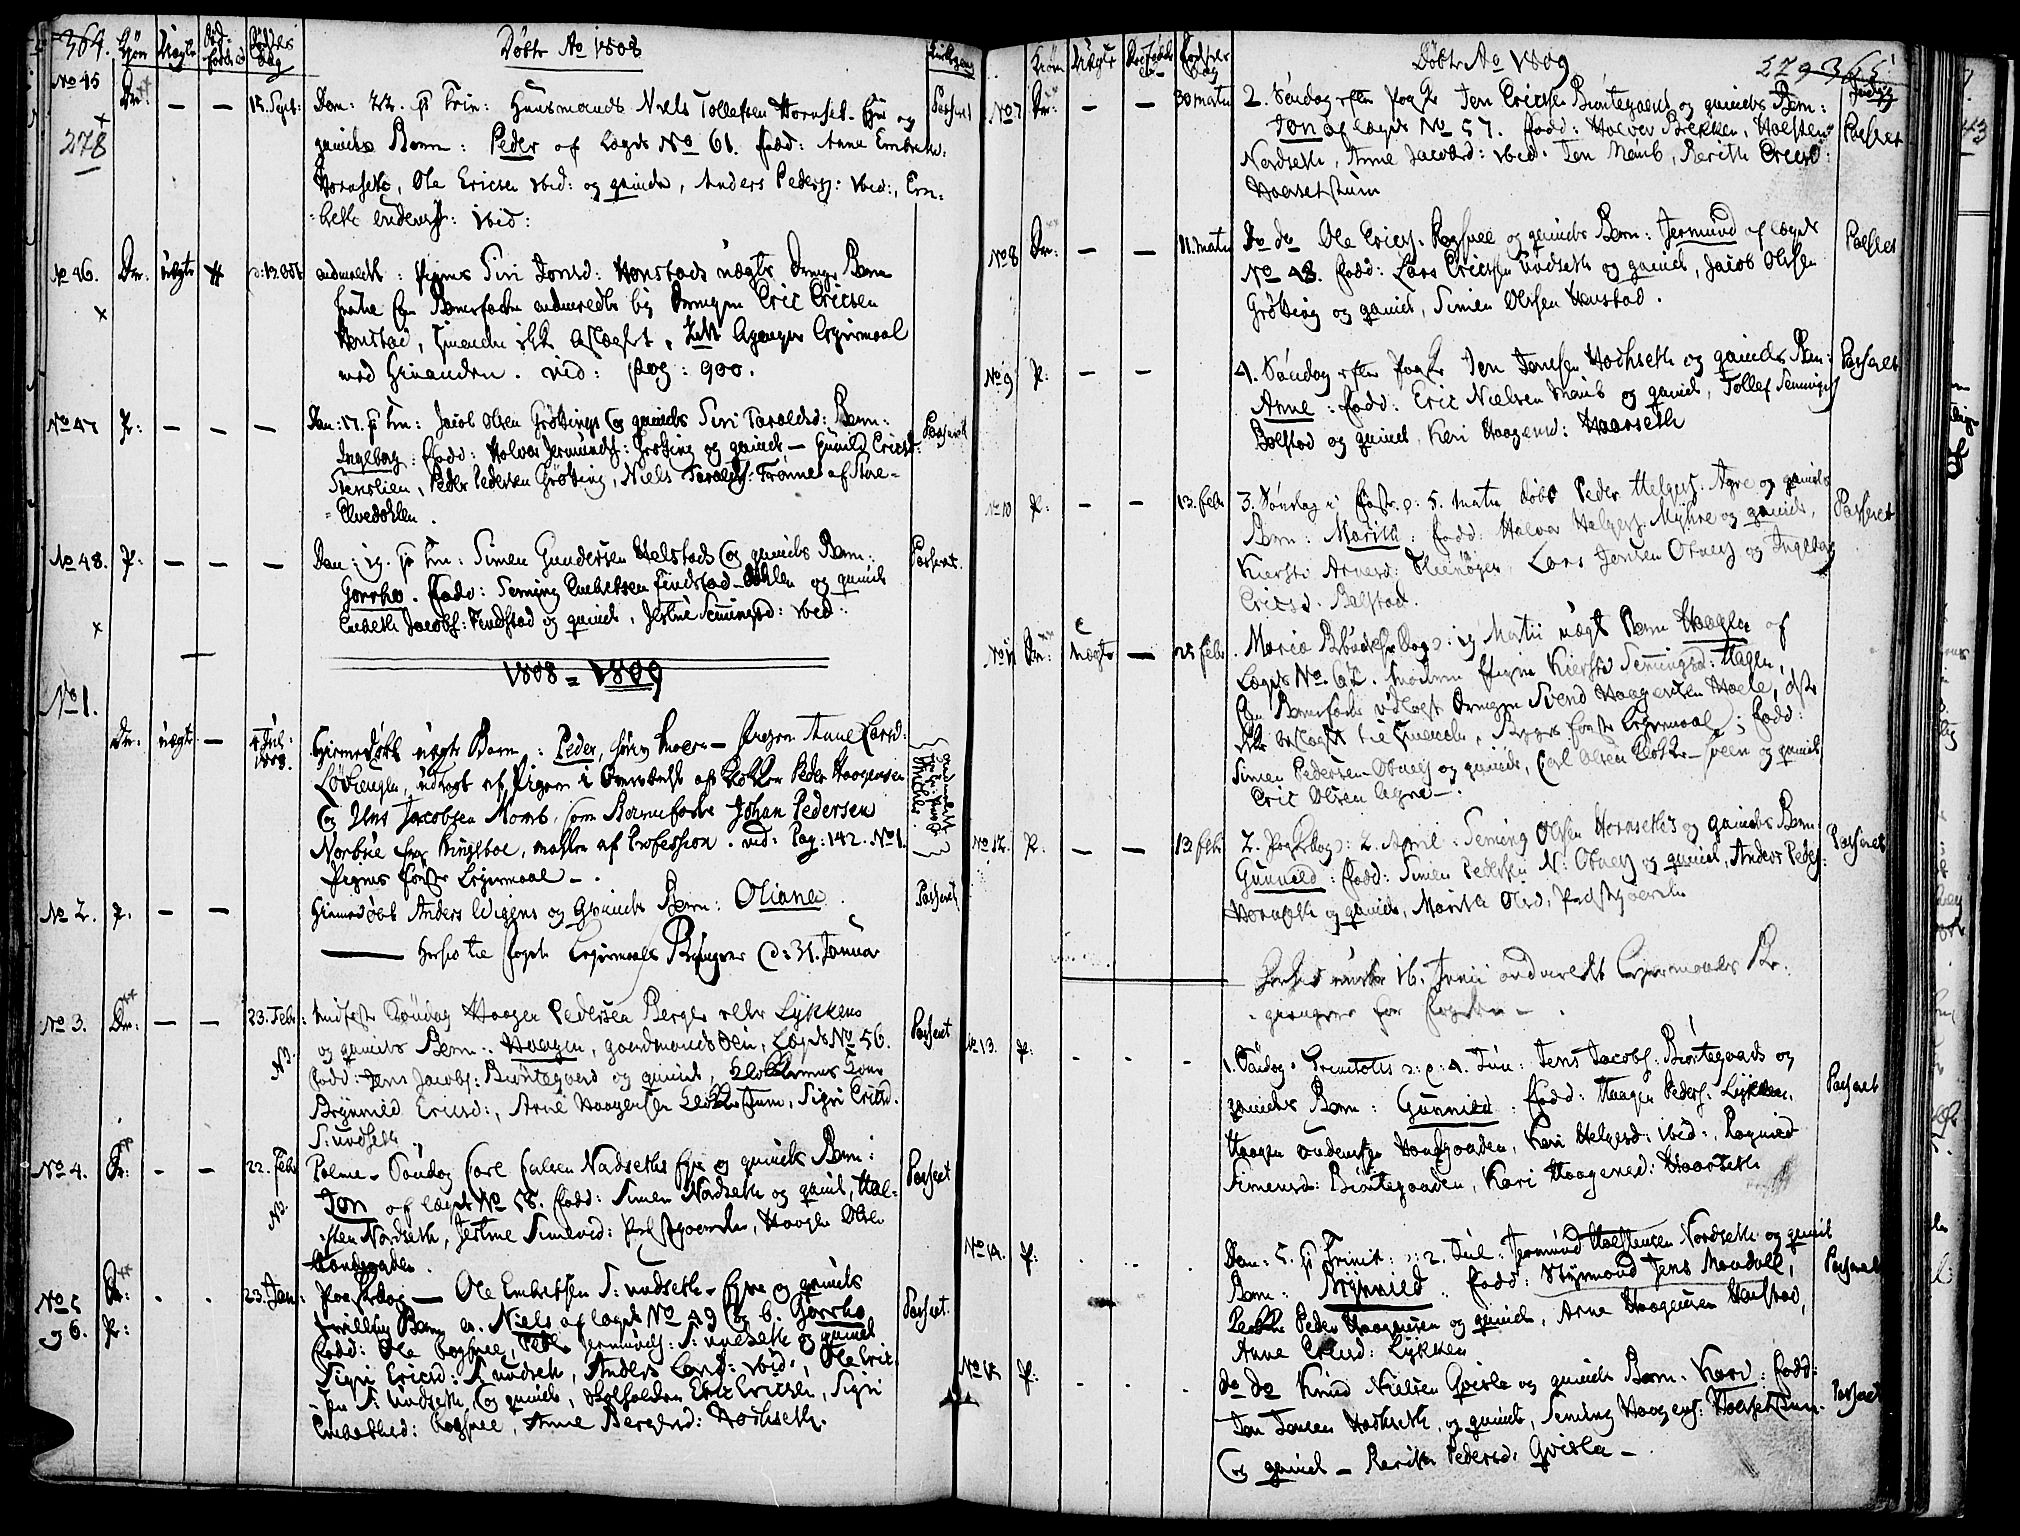 SAH, Rendalen prestekontor, H/Ha/Haa/L0002: Ministerialbok nr. 2, 1788-1814, s. 278-279